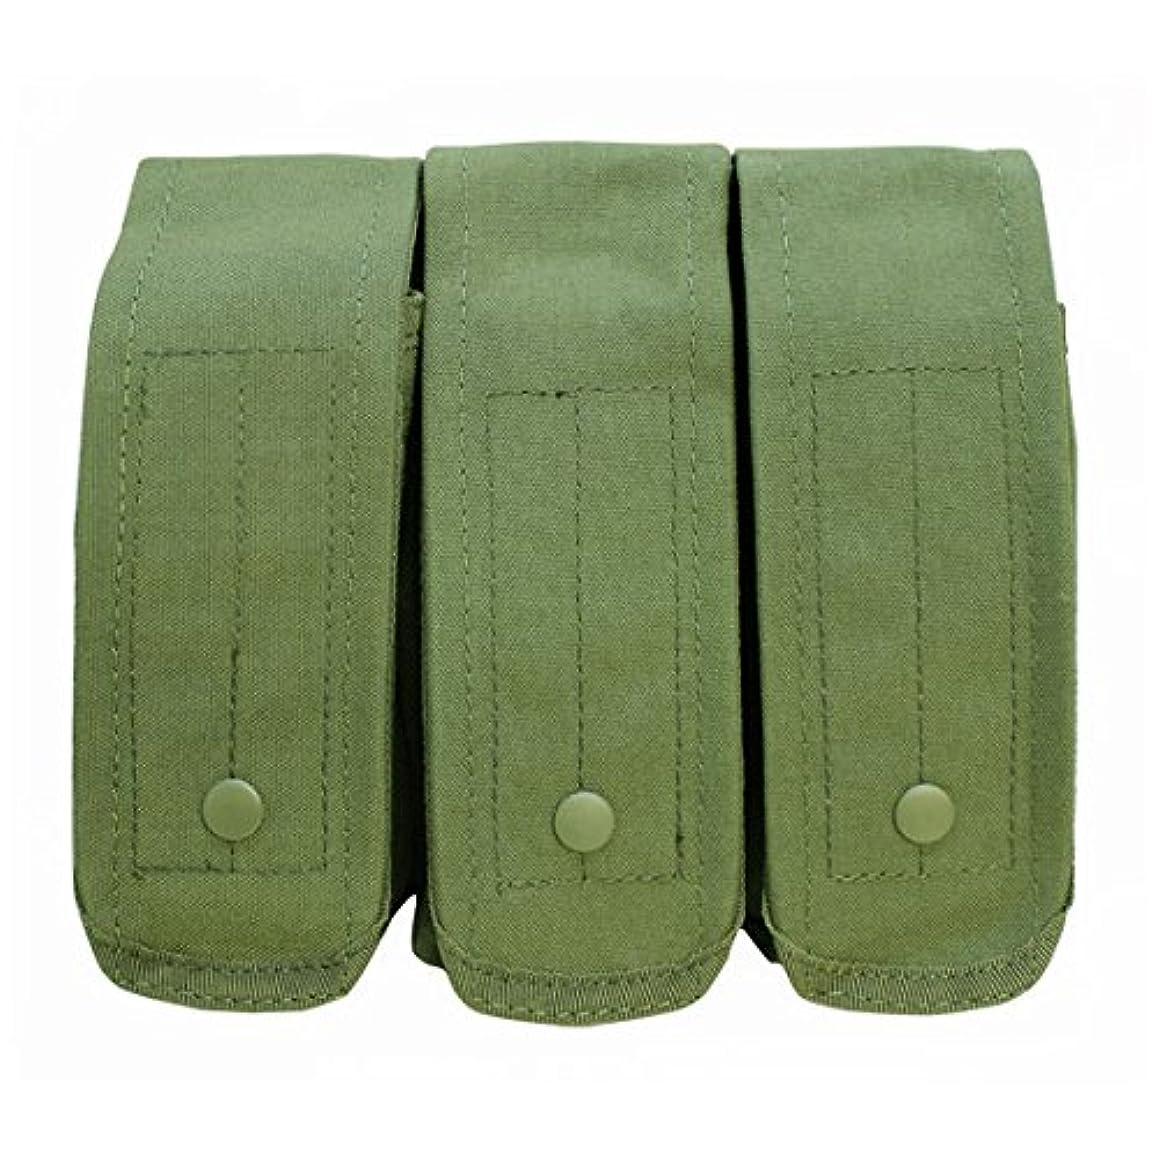 Tactical OD GREEN AK AR Triple 7.62 5.56 Mag Pouch Trio 3 Clip PALS Bag Holder